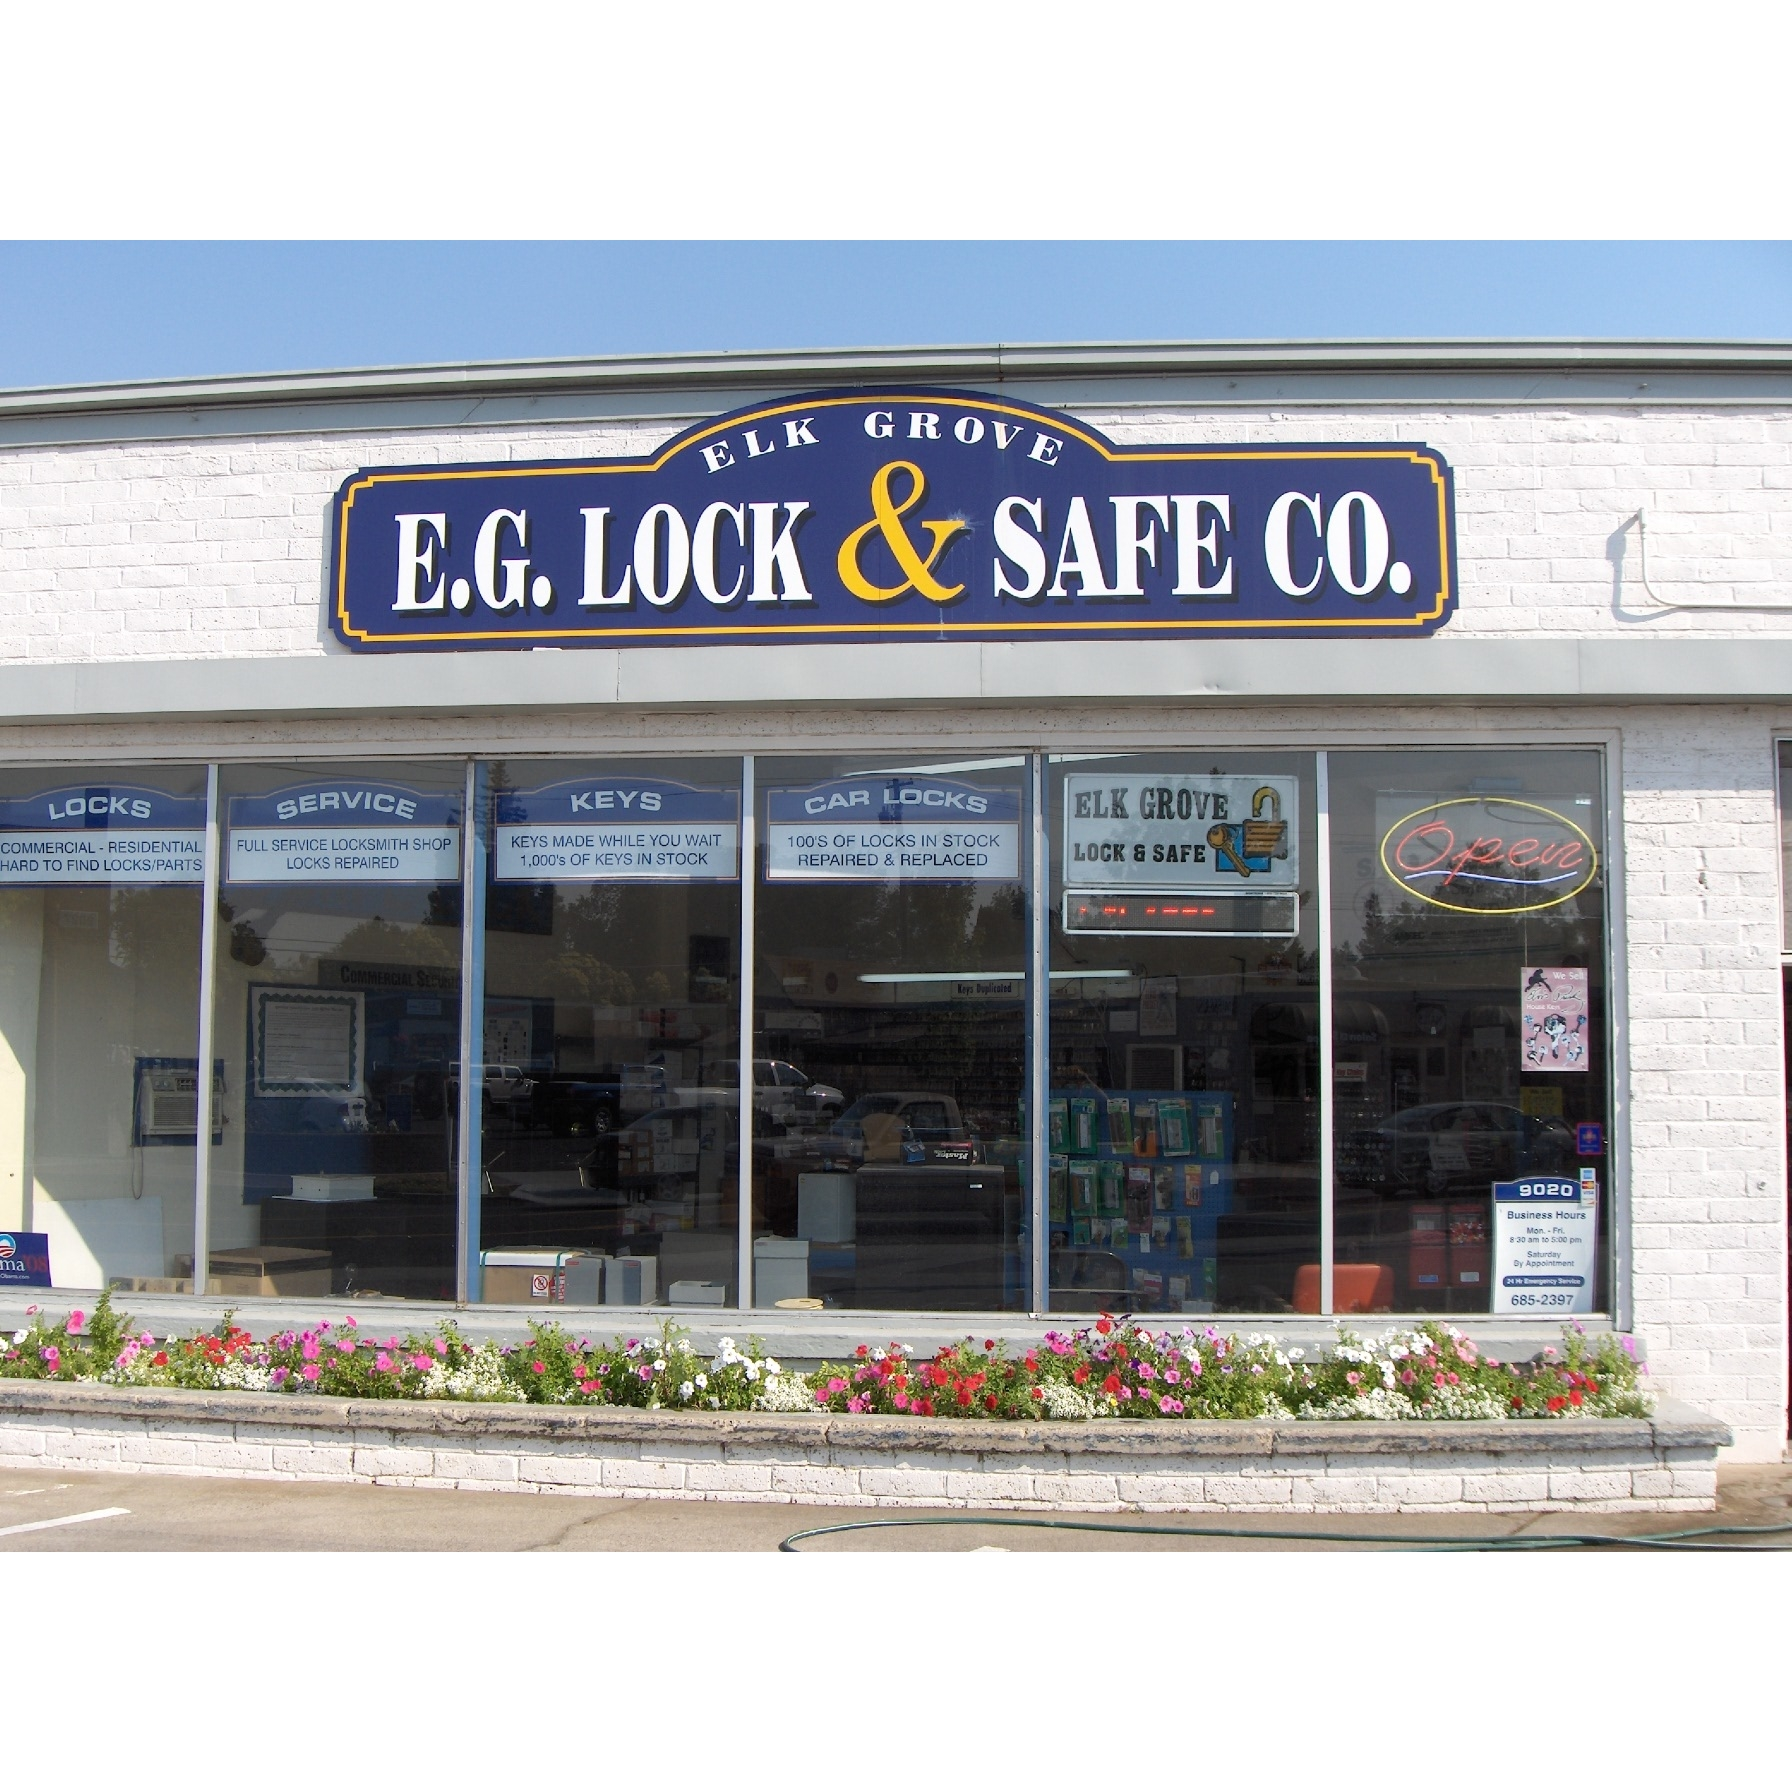 Elk Grove Lock & Safe Co. In Elk Grove, CA